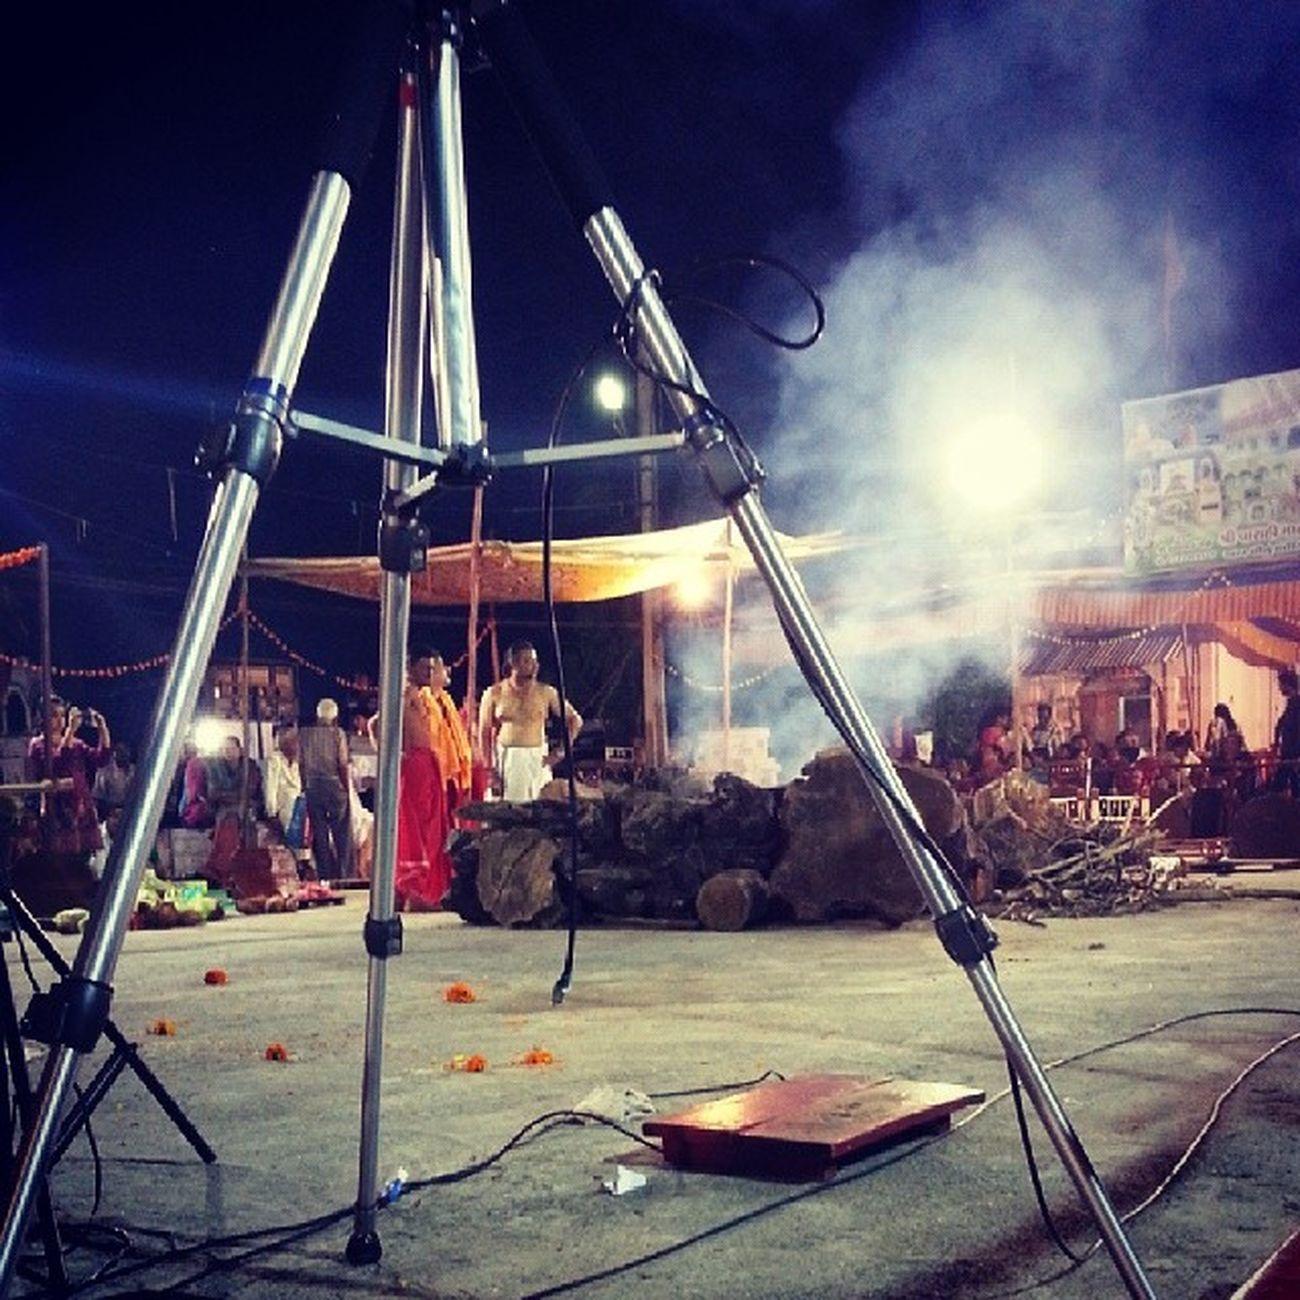 Havan Umreth Gujarat India